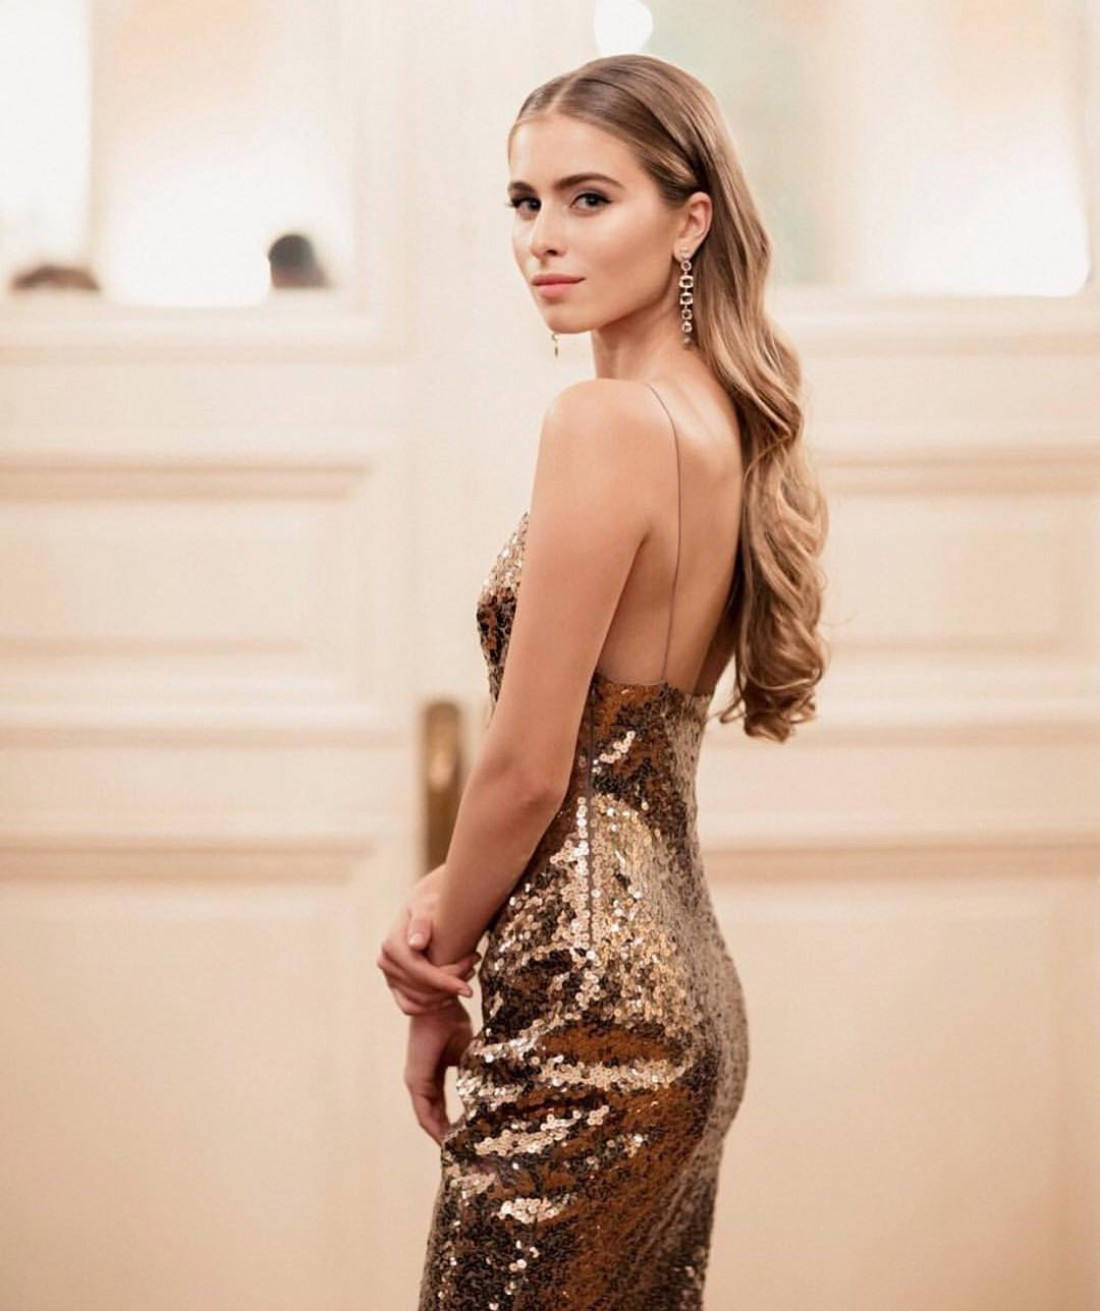 Соня Евдокименко стала моделью года